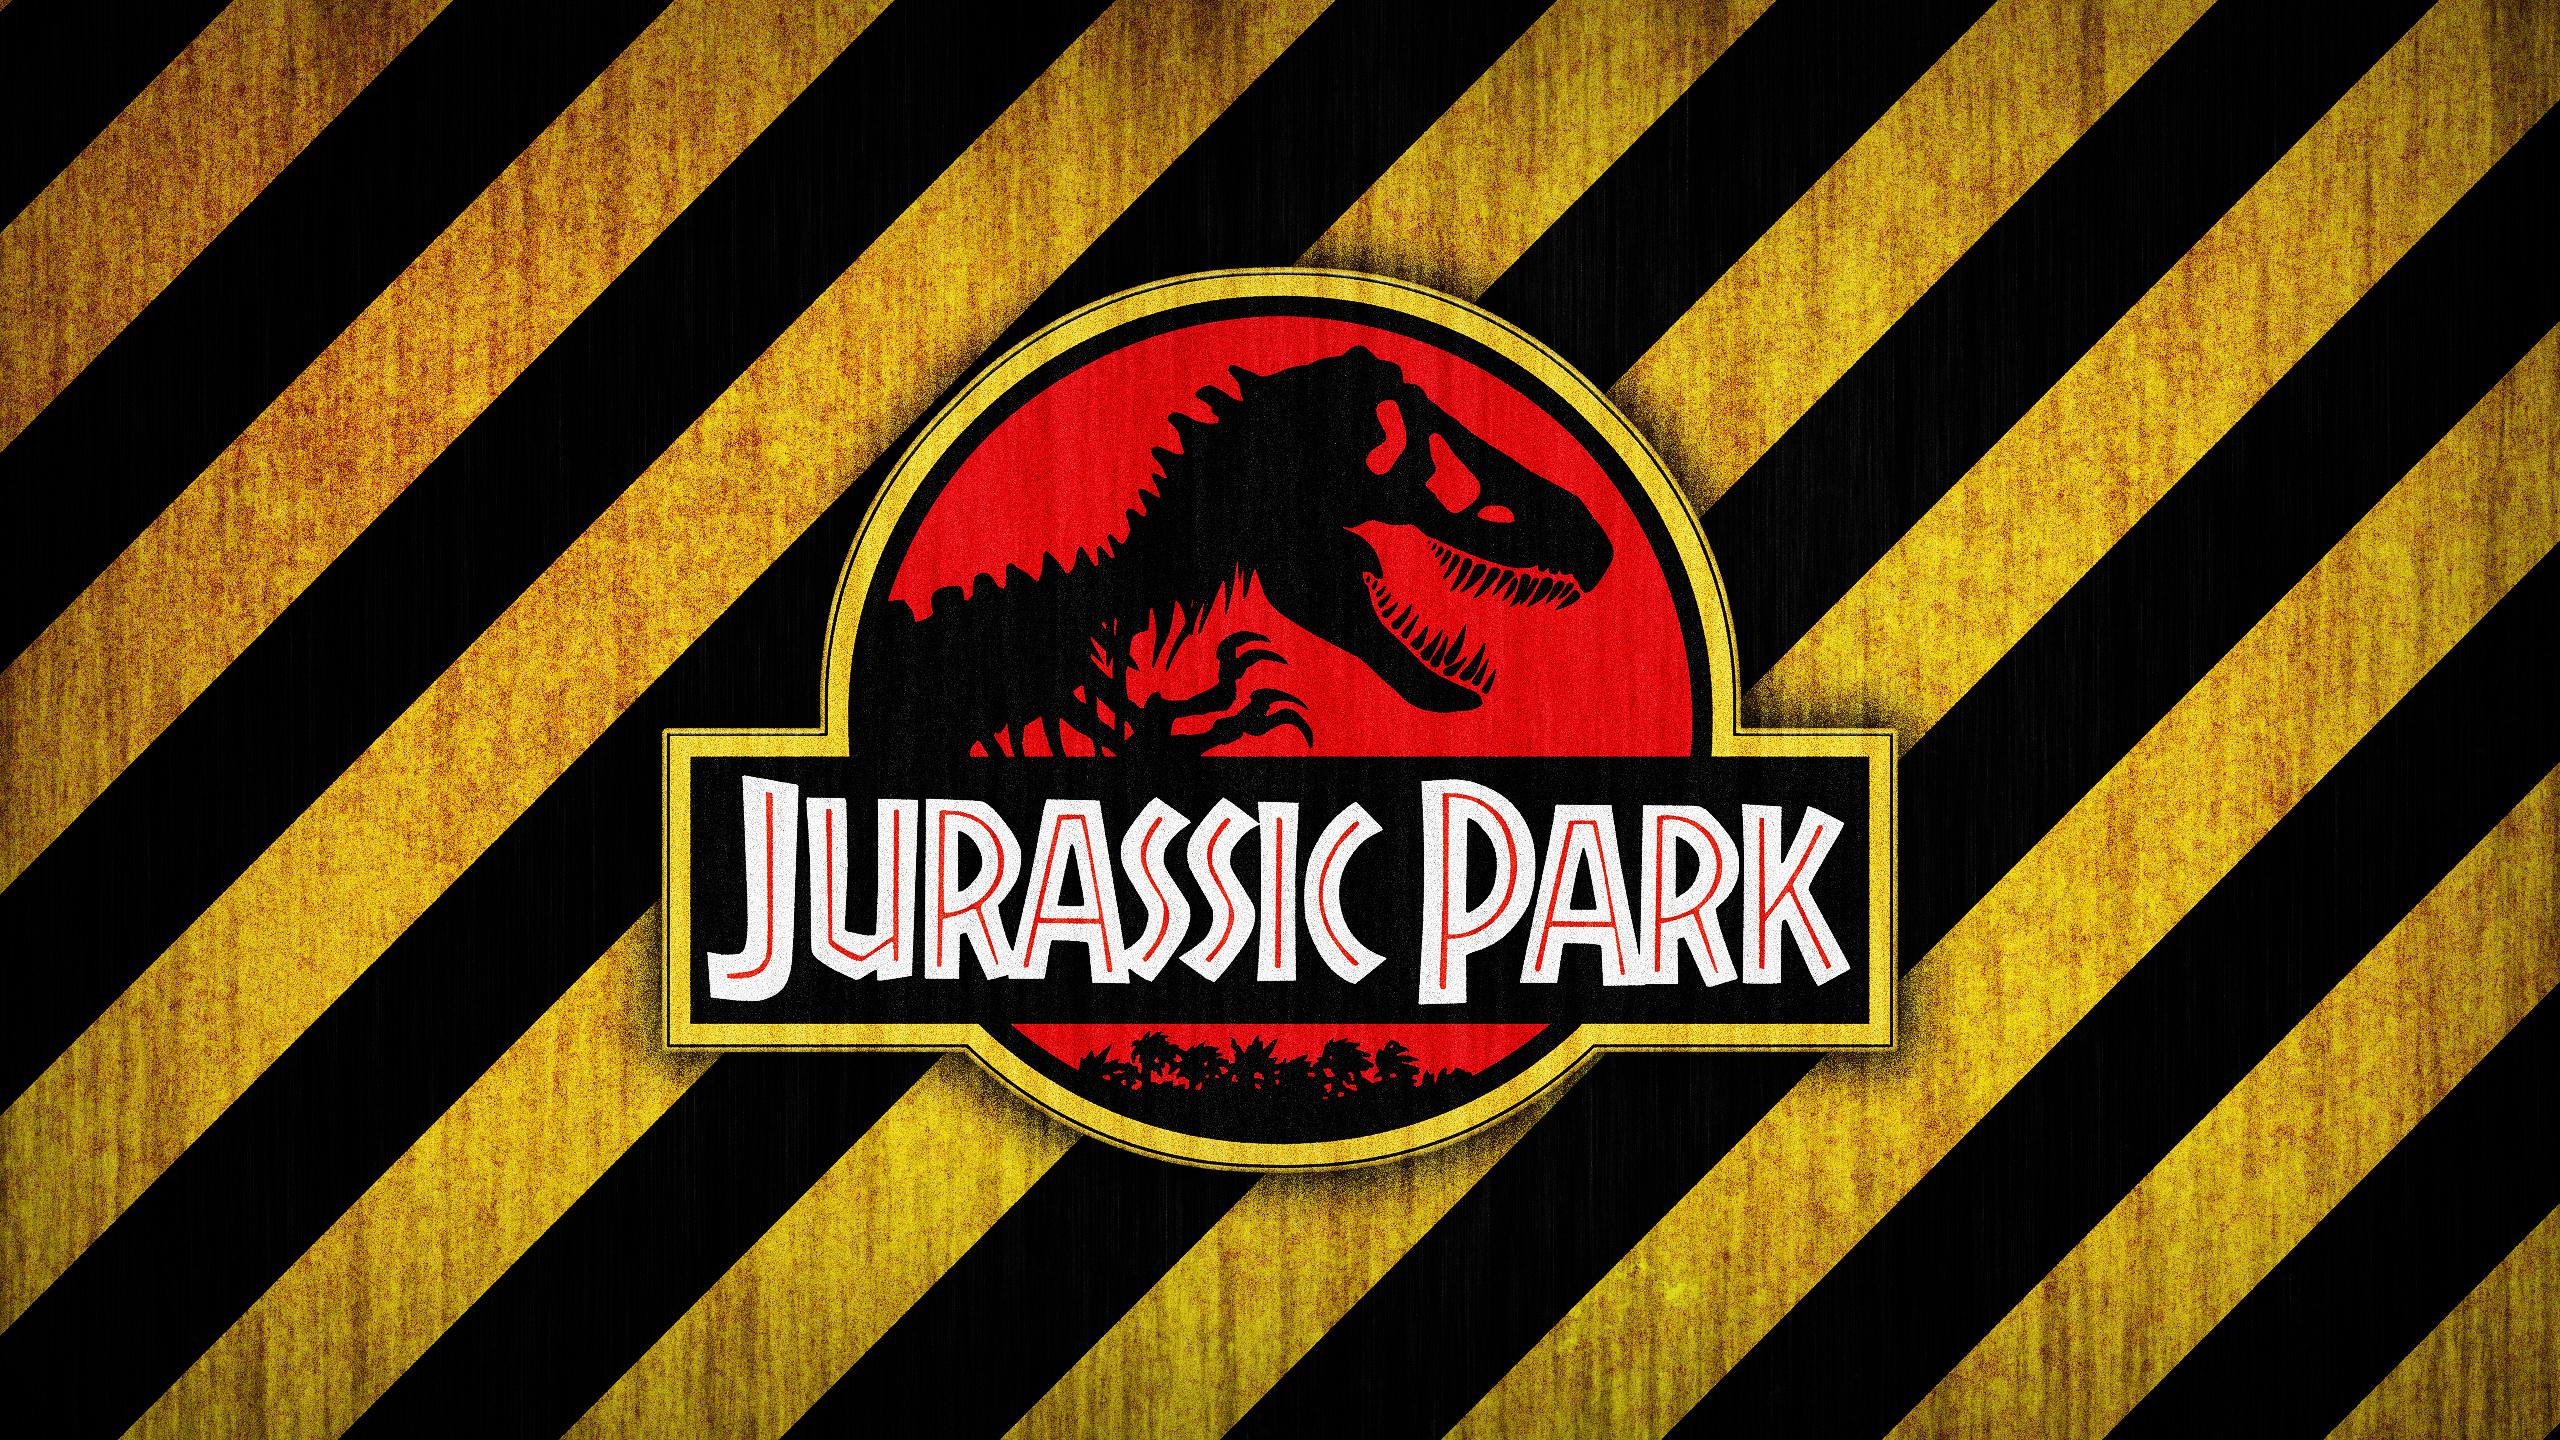 Jurassic Park HD Wallpaper   Background Image   2560x1440   ID:425706 - Wallpaper Abyss